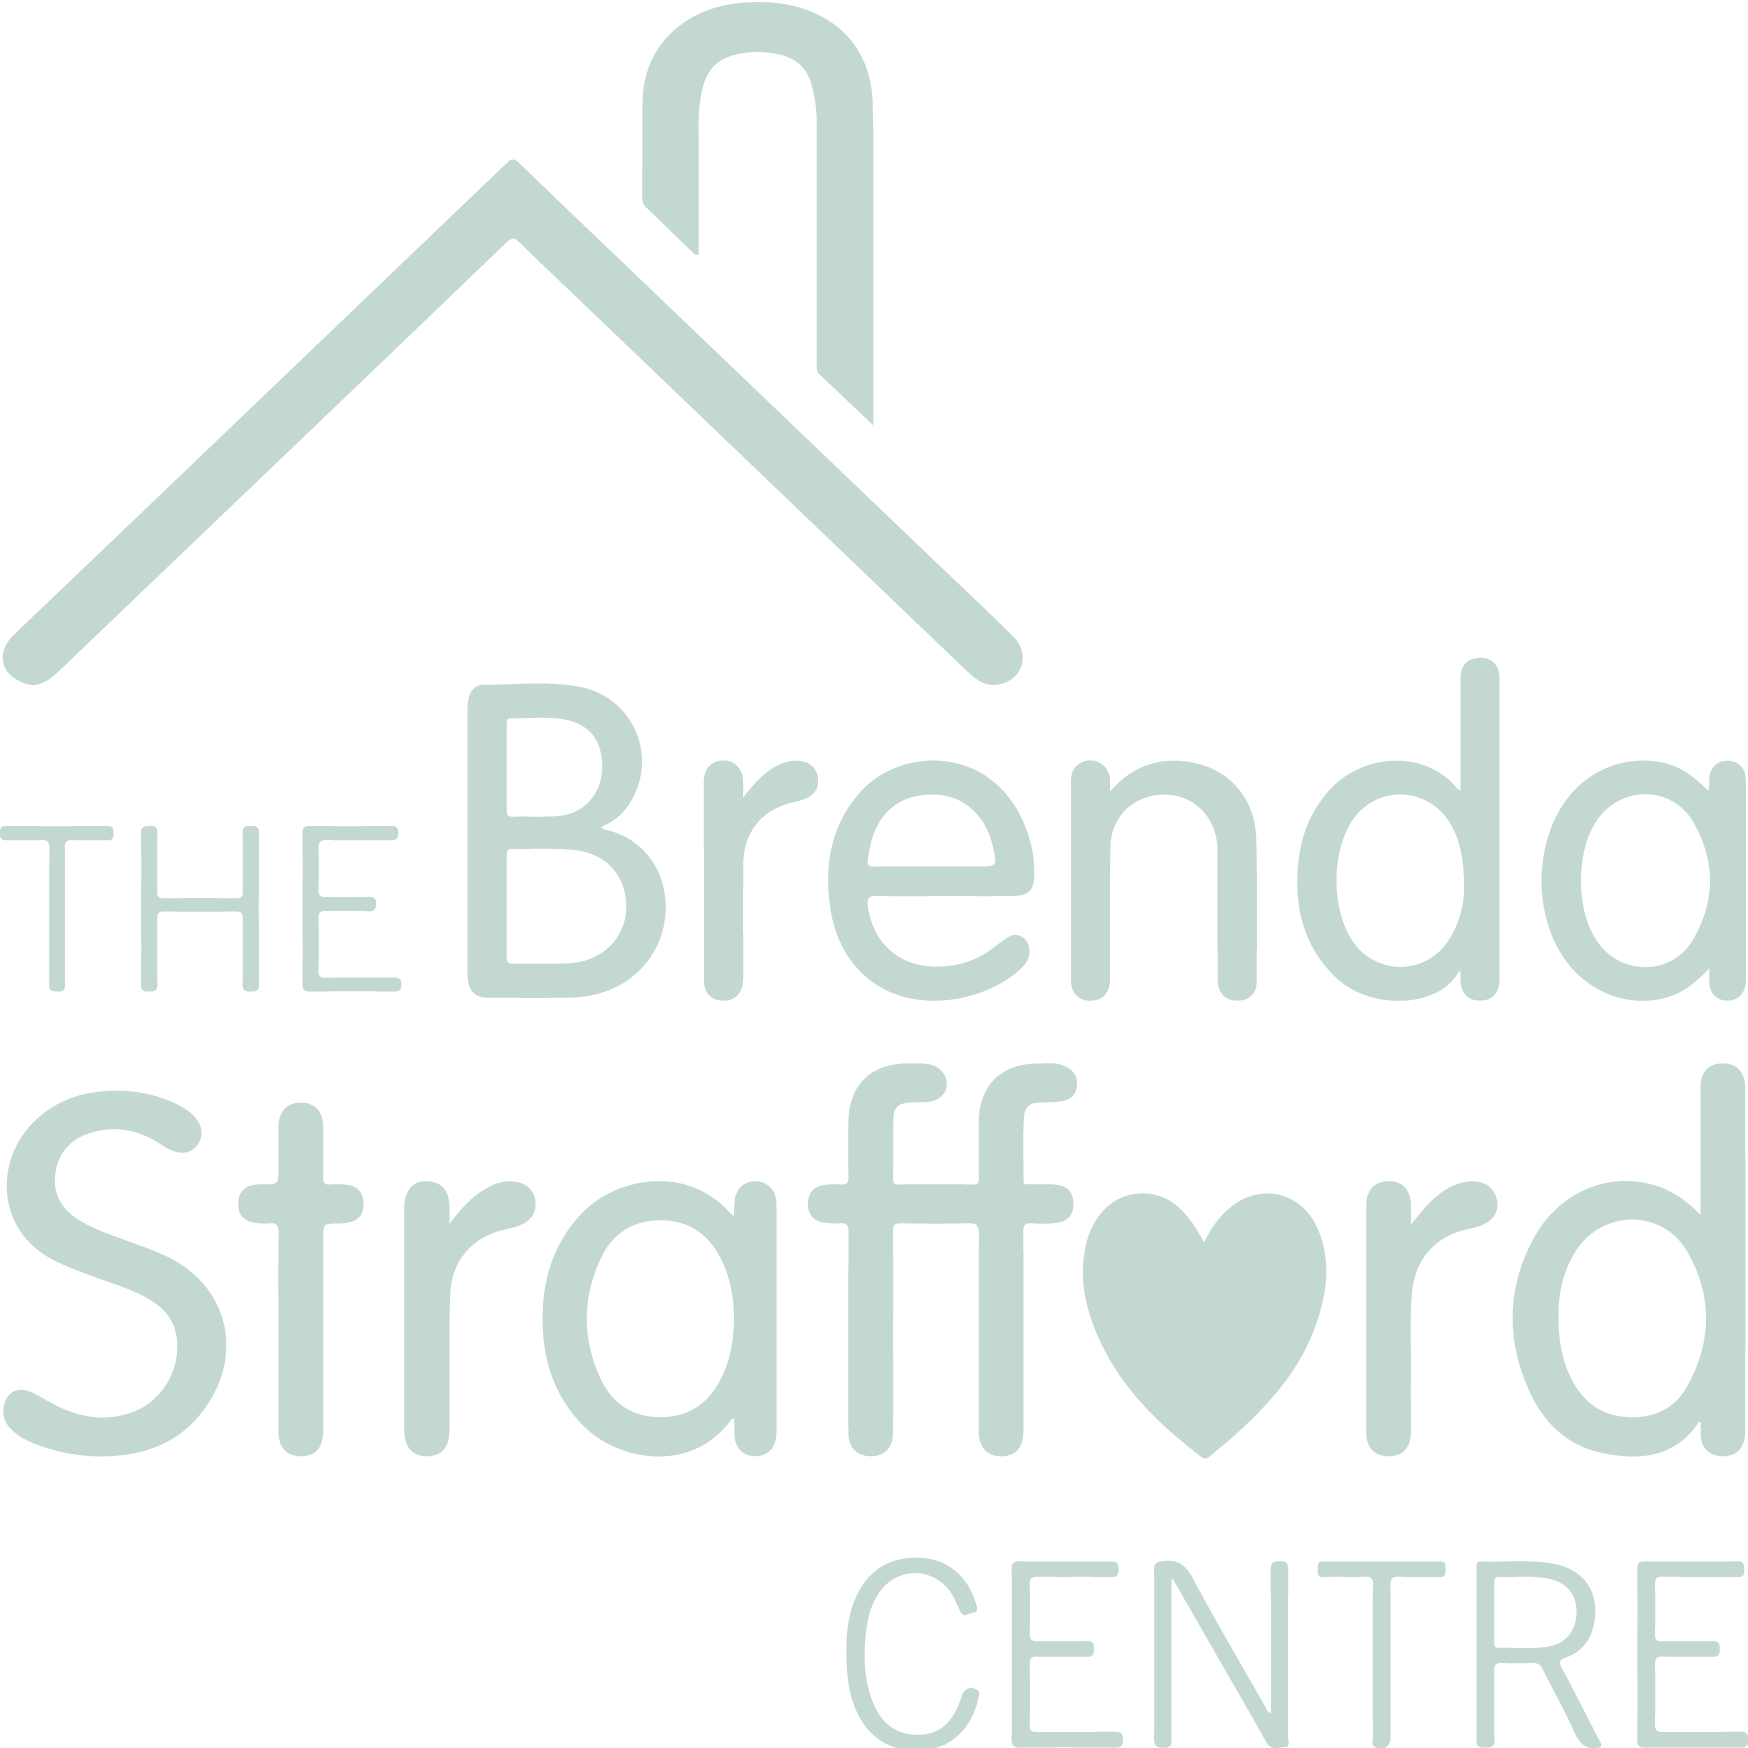 Brenda Strafford Centre